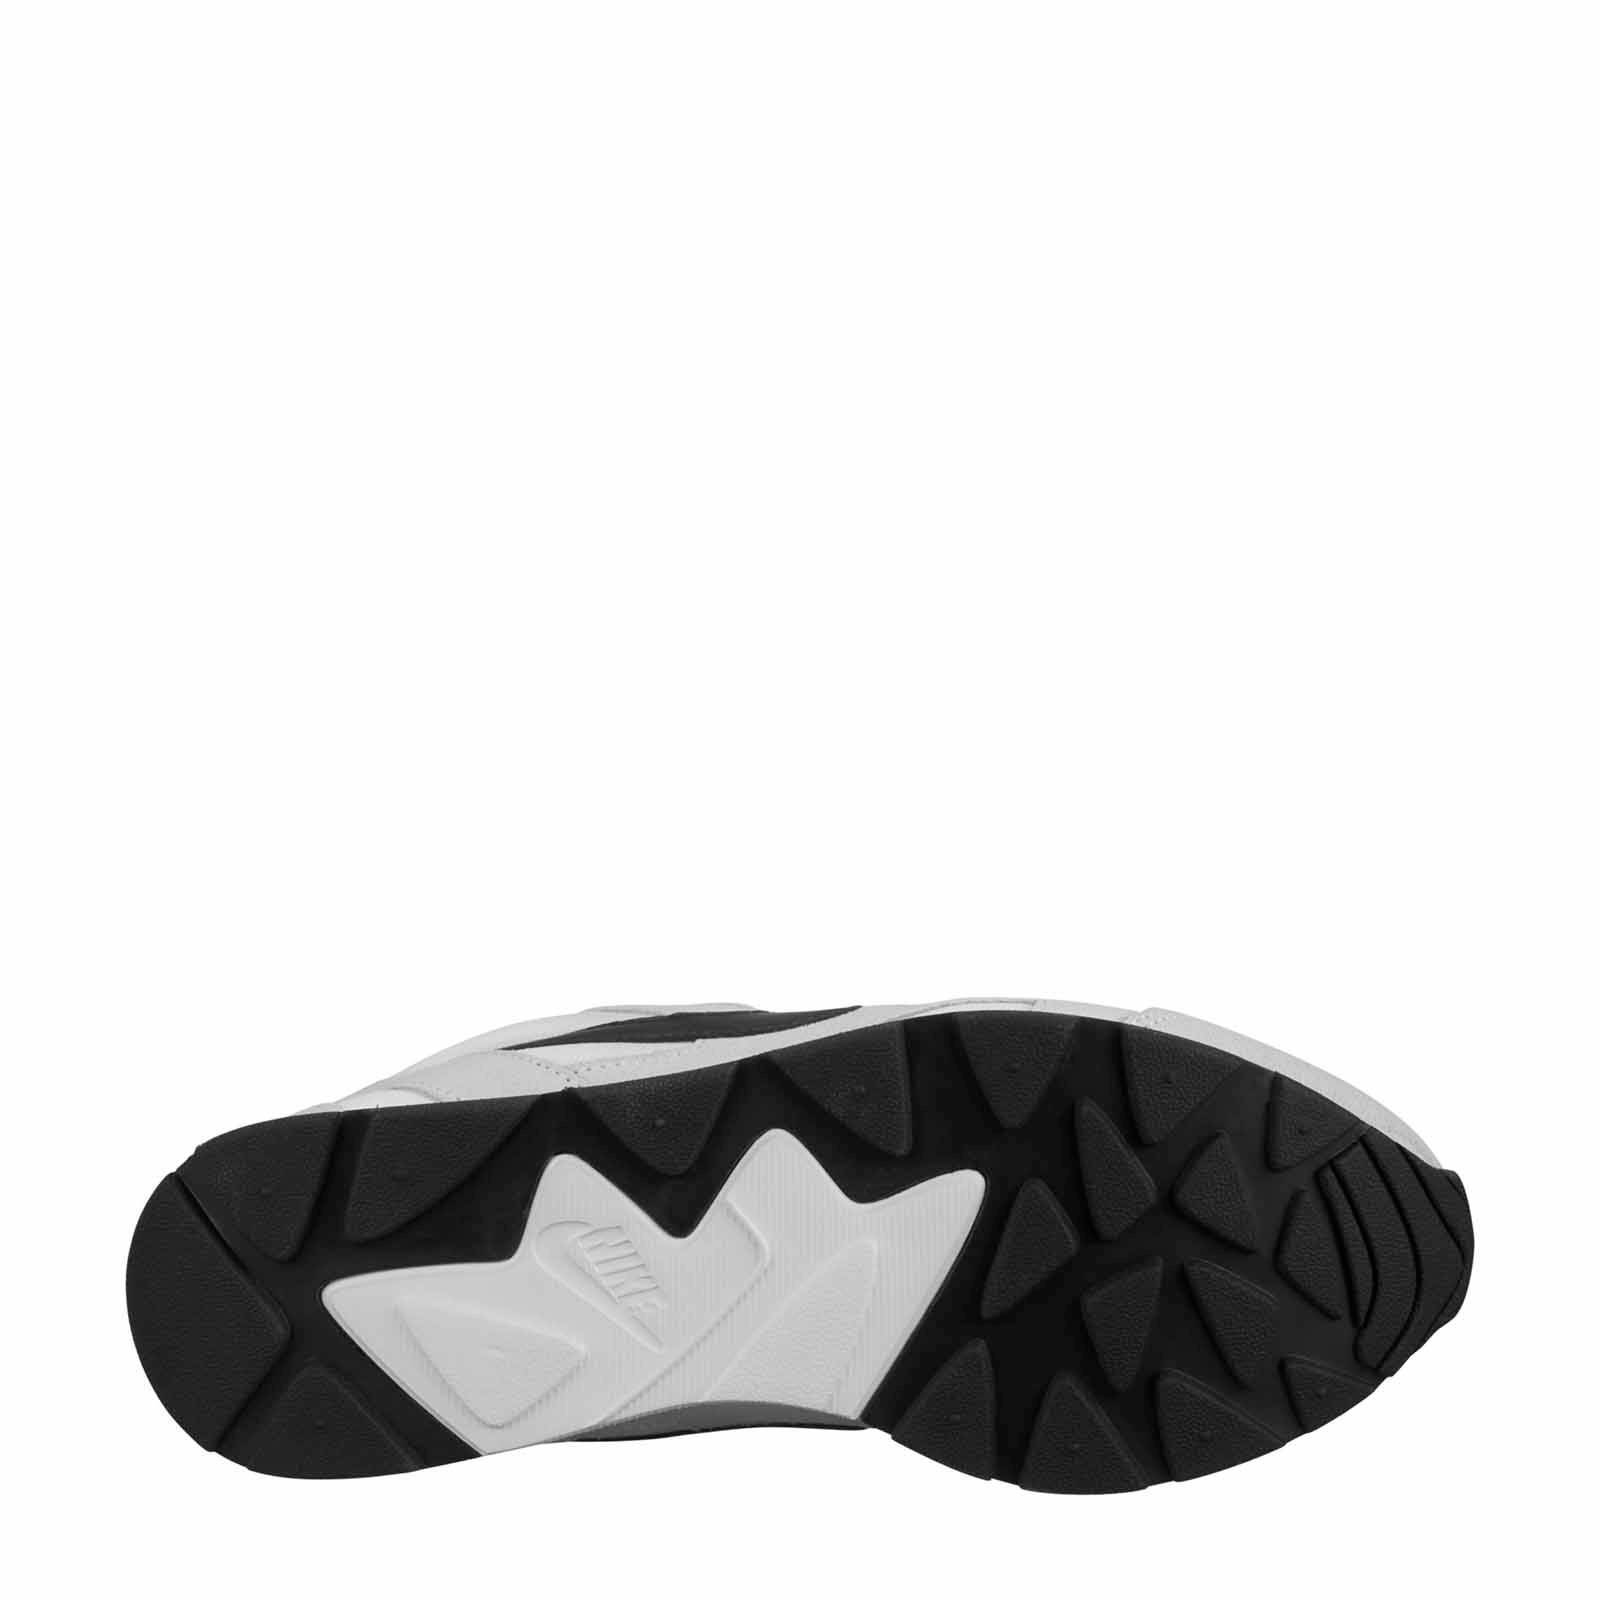 best service 3af4c 91fce Nike Delfine sneakers wit zwart   wehkamp